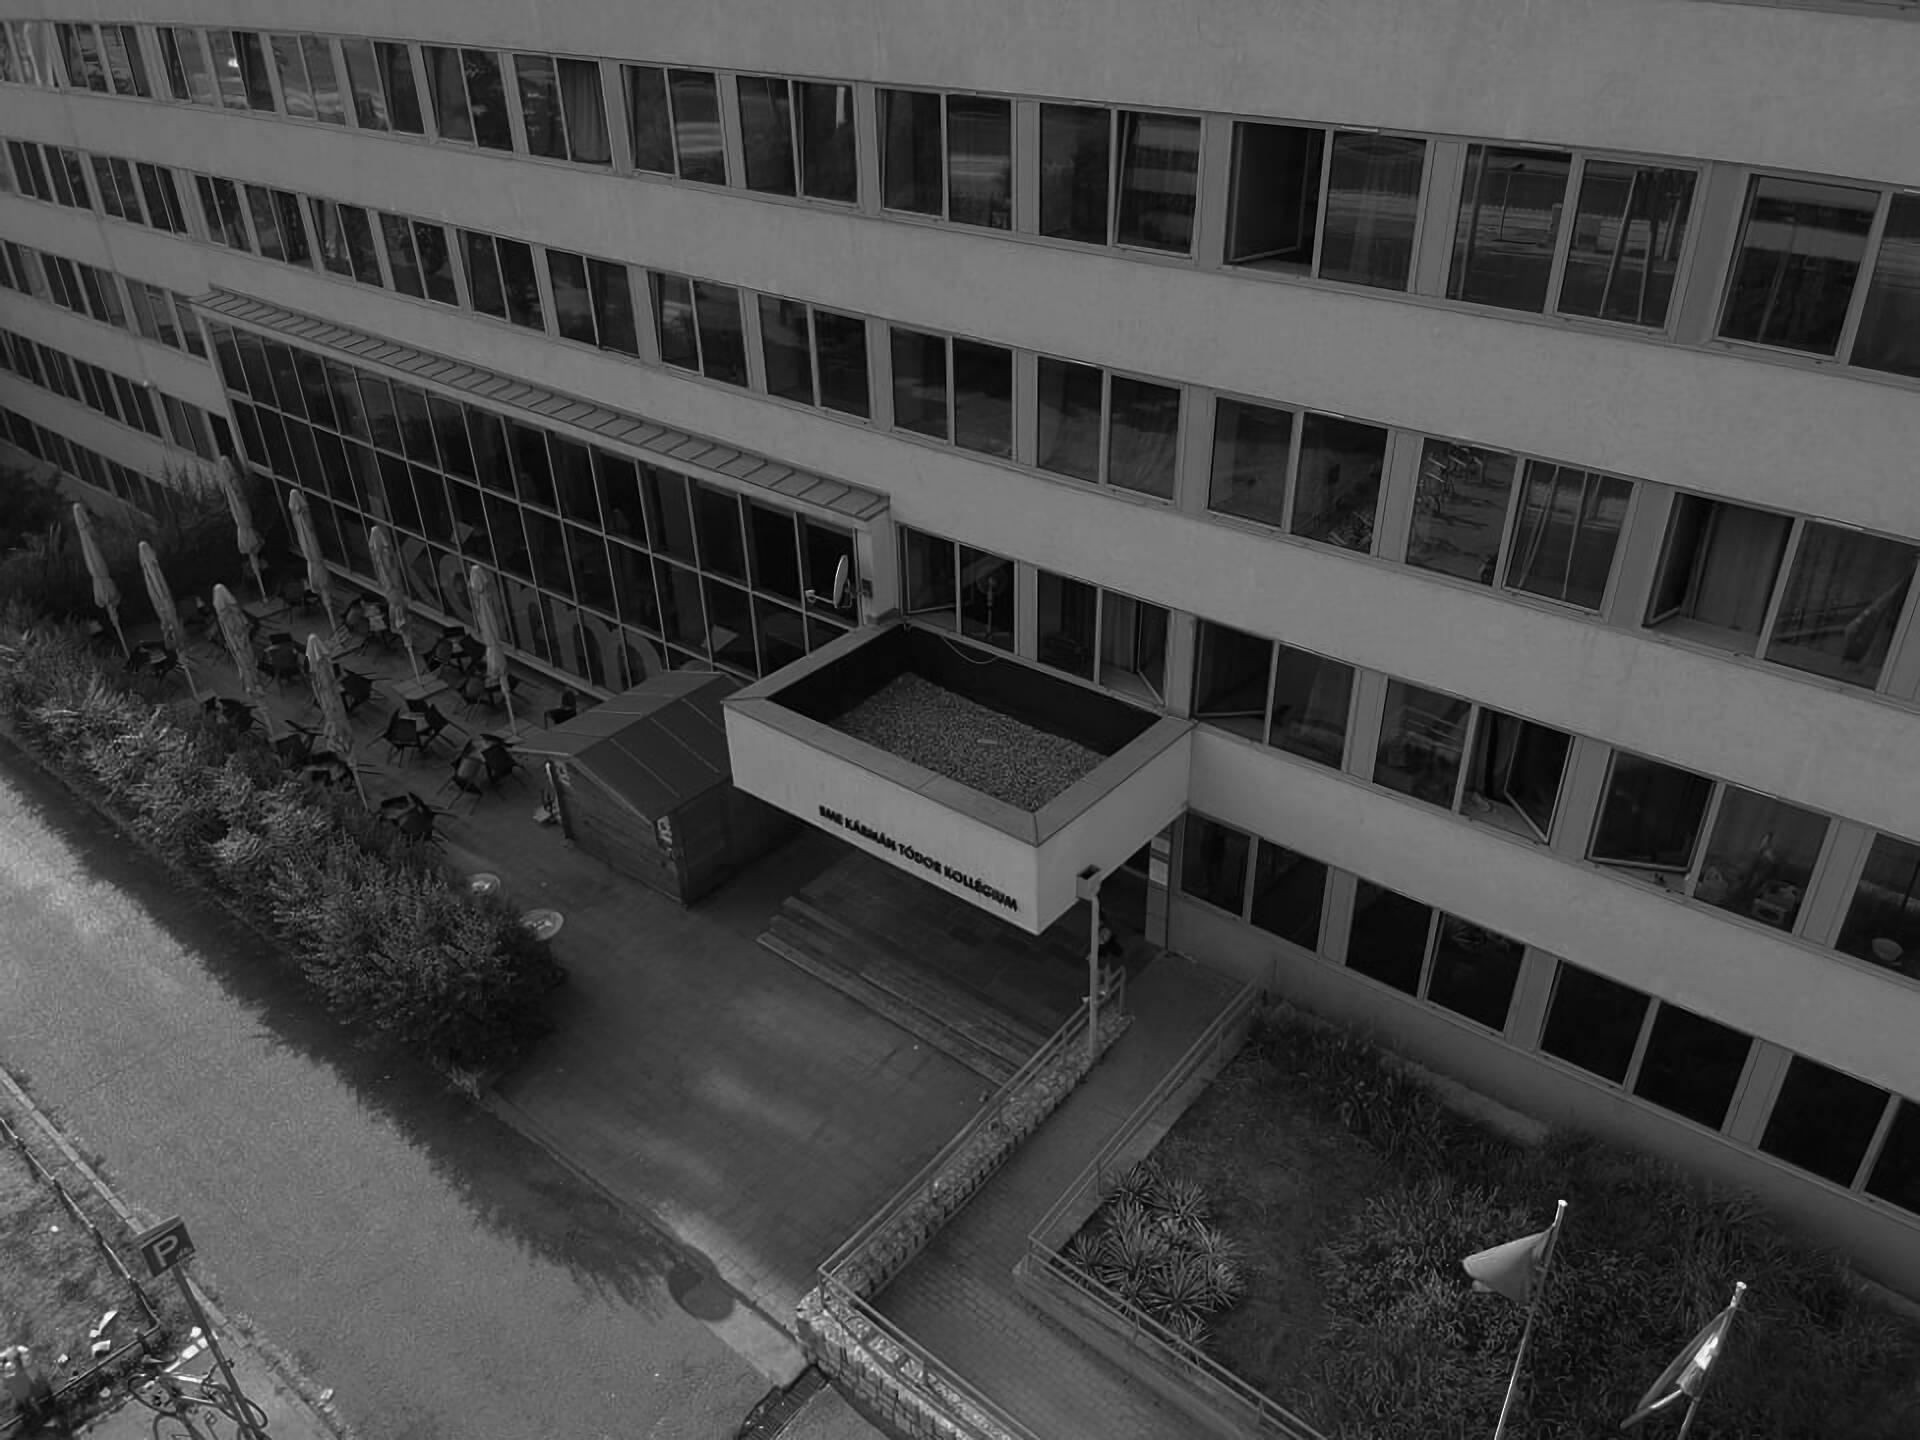 Bird's eye view of the Theodore von Karman dormitory